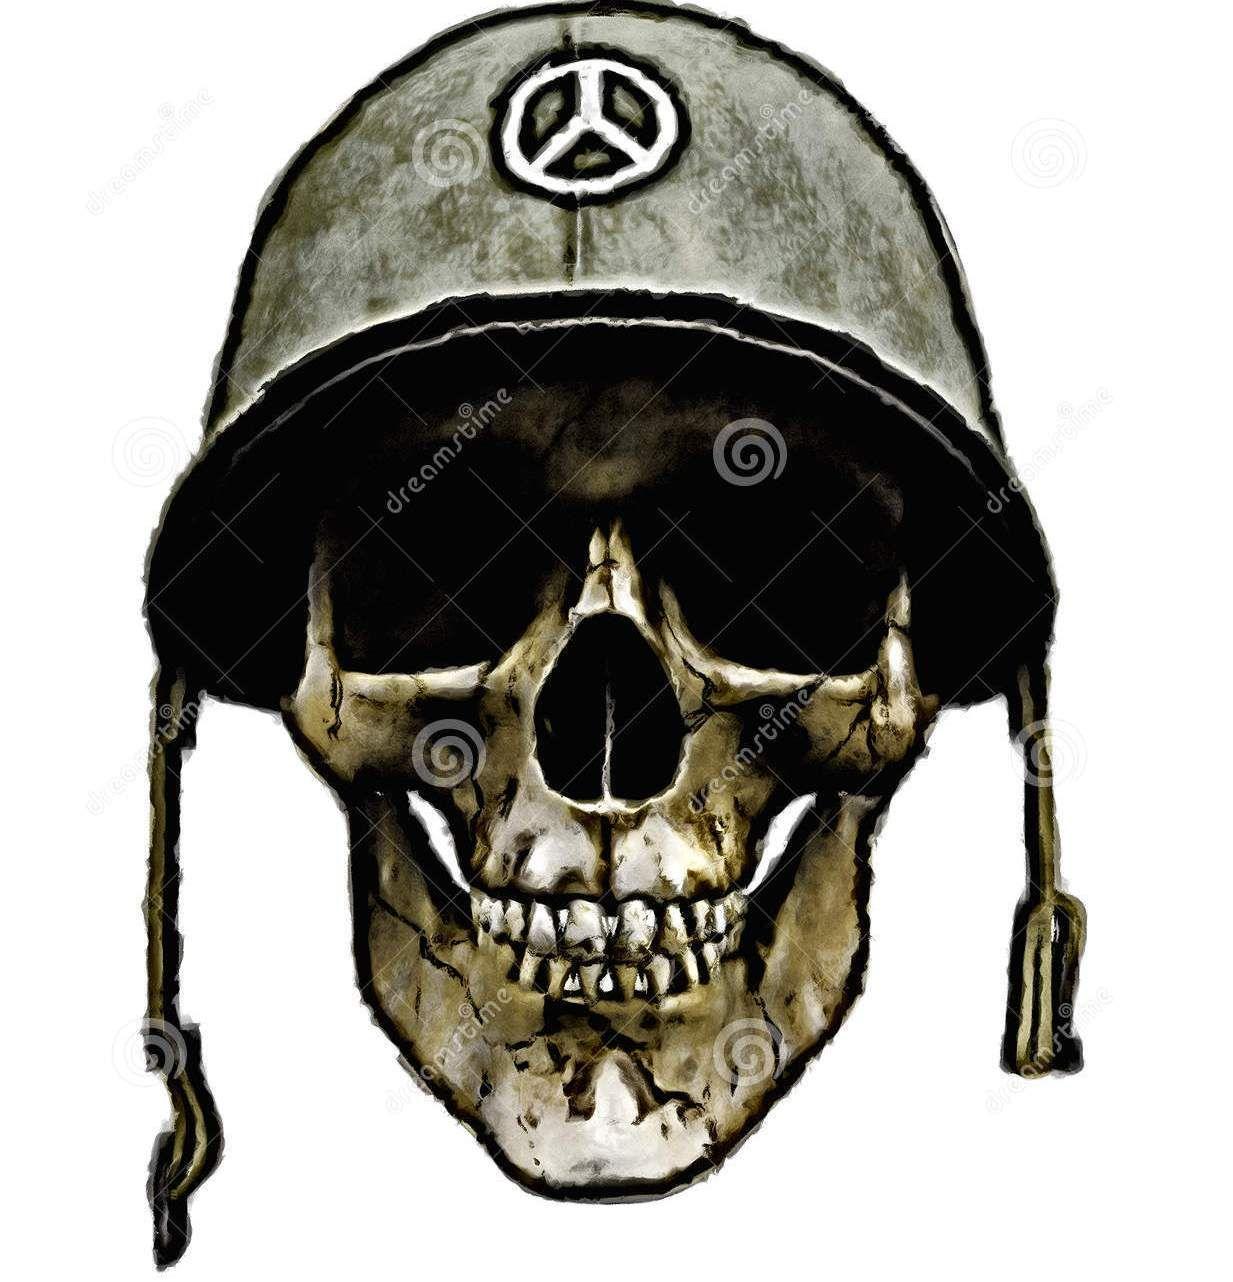 American Army Helmet Dead Soldier Tattoo Design | Bike